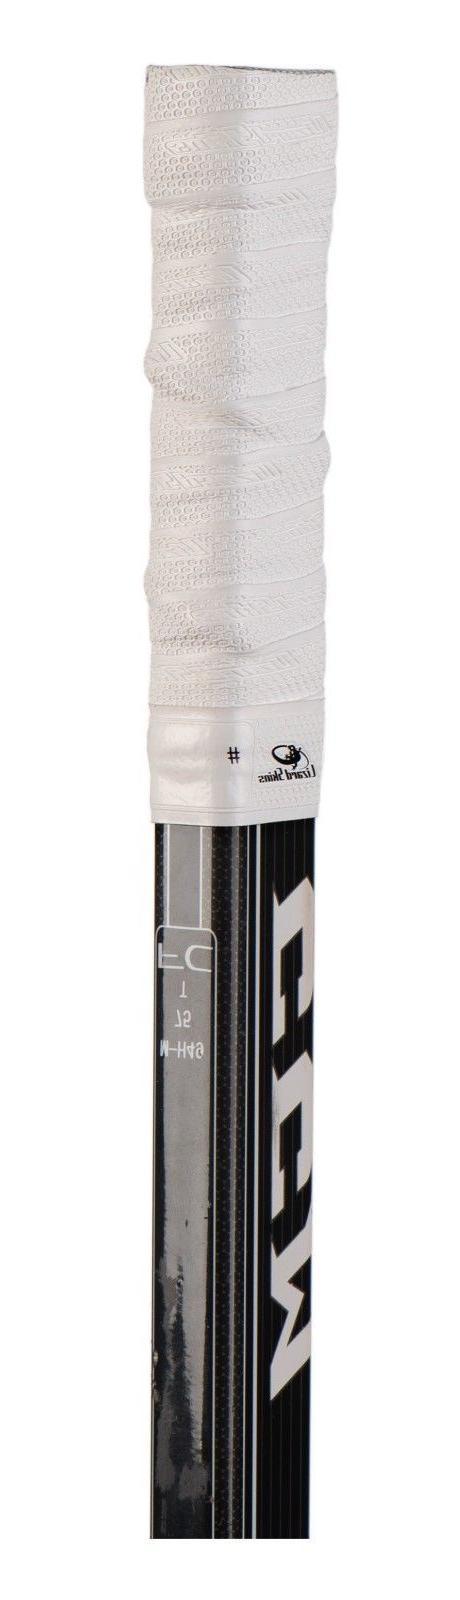 Lizard .5mm Stick Grip Tape Colors